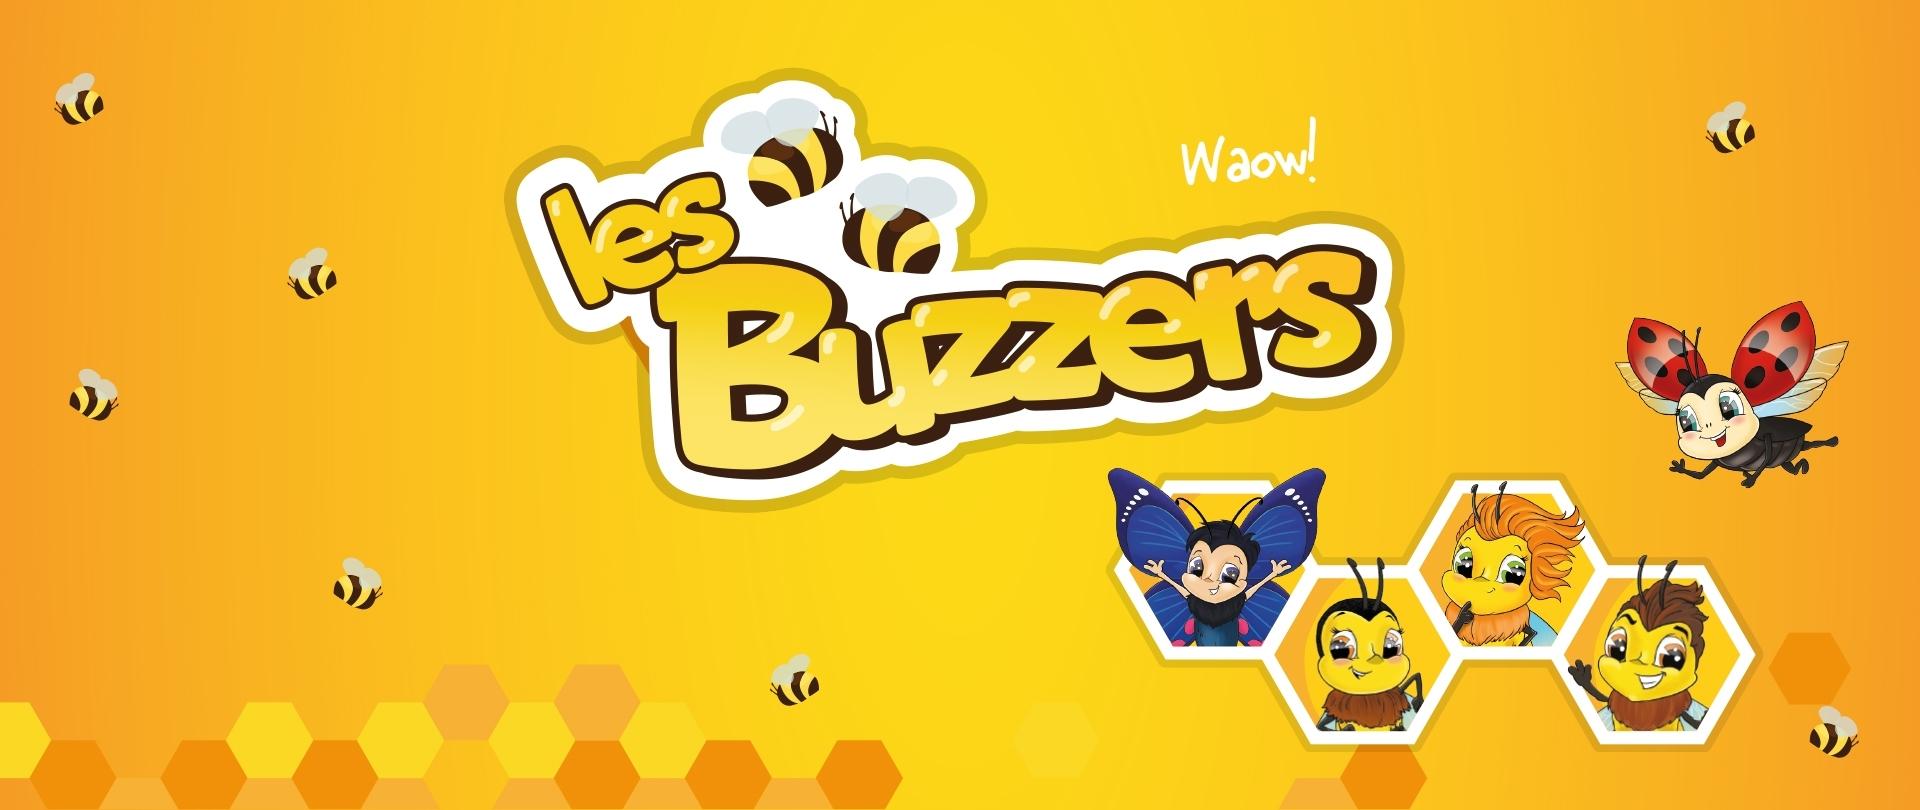 Les Buzzers